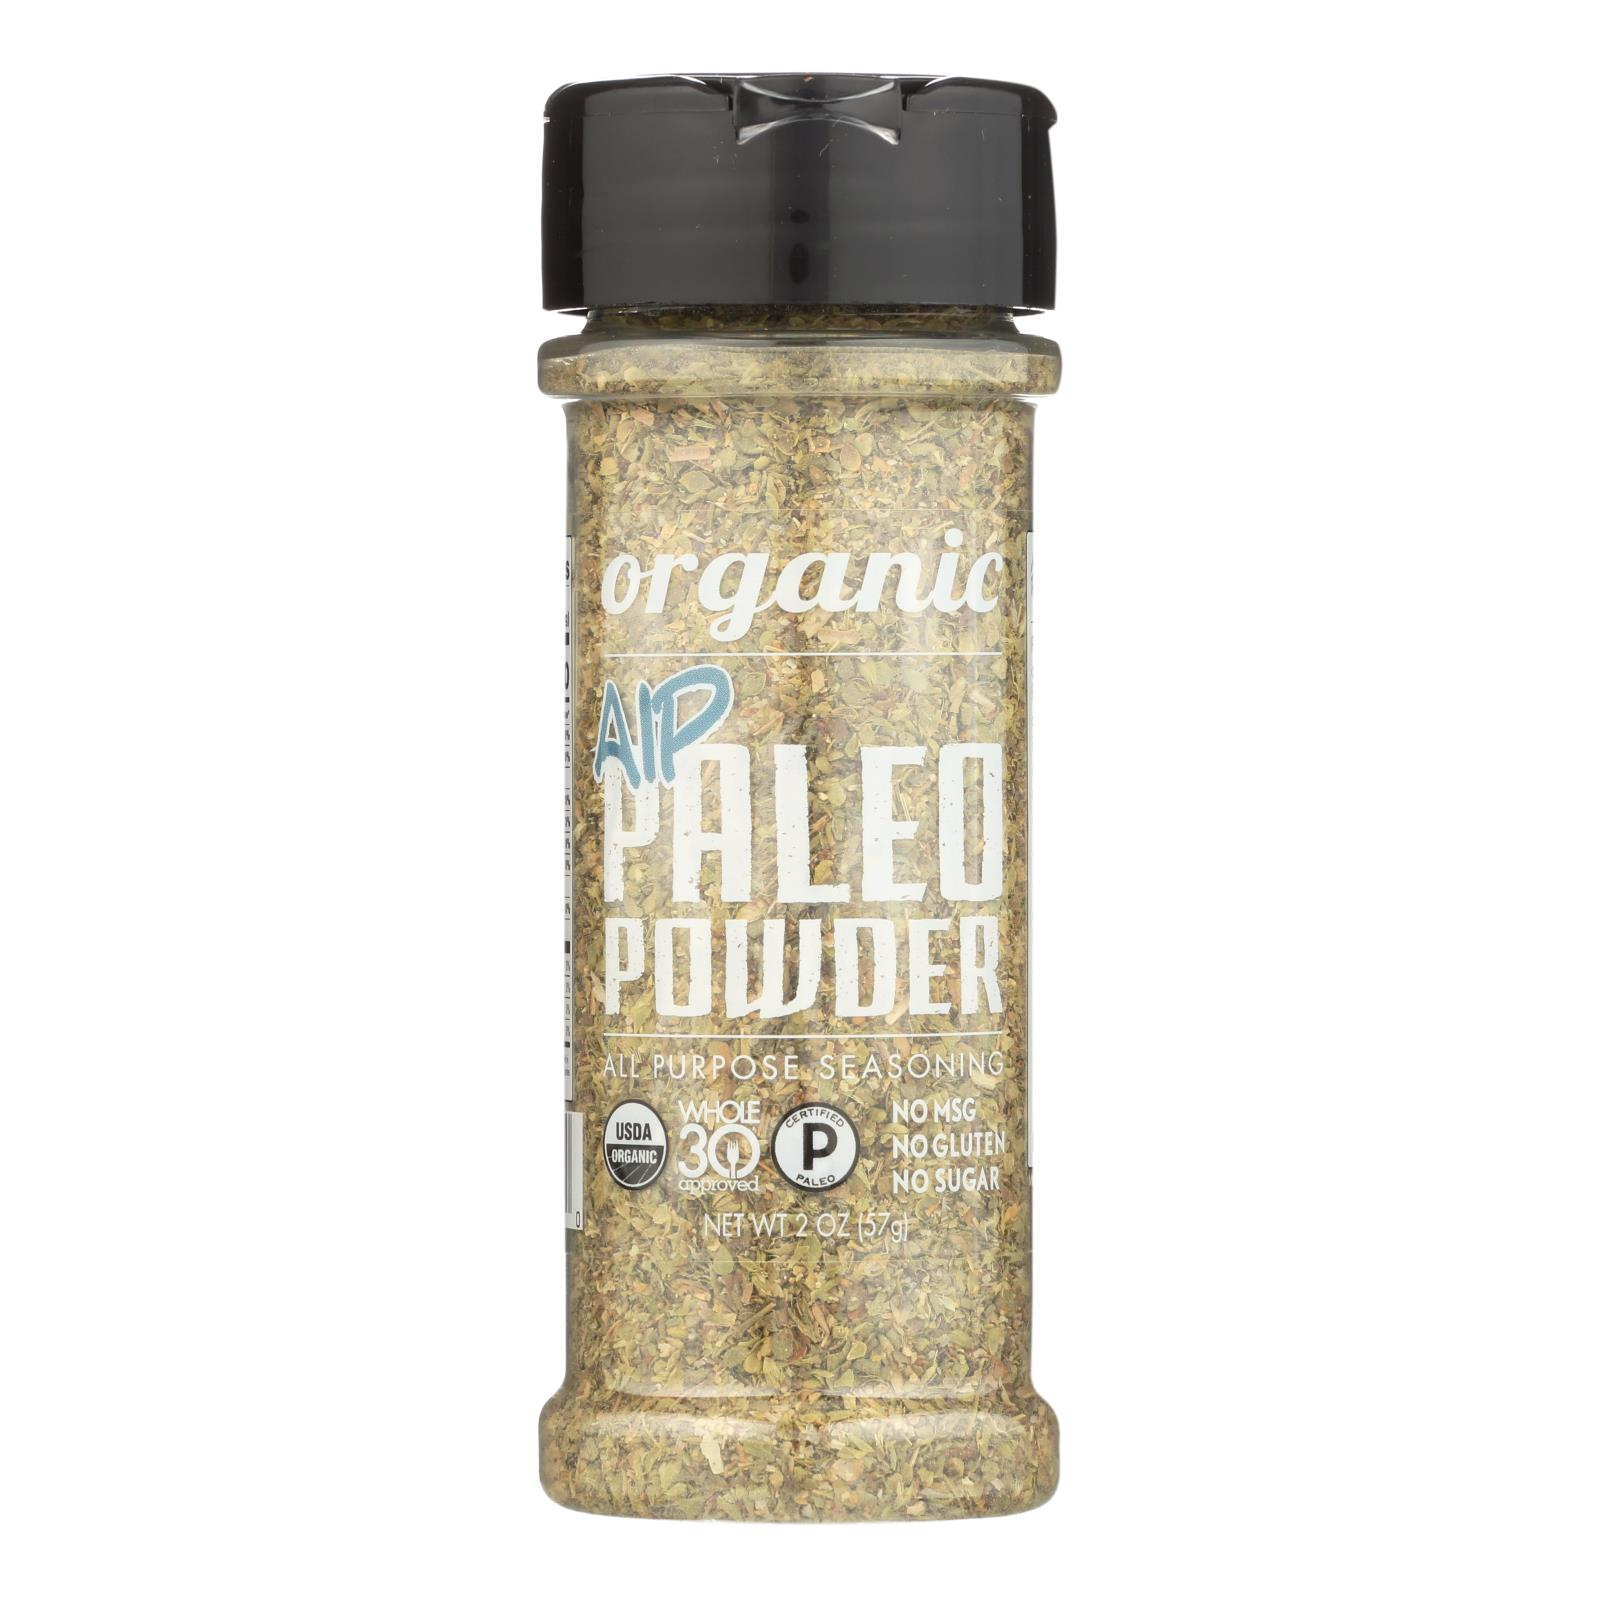 Paleo Powder Seasonings - Paleo Powder - Autoimmune Protocal - Case of 6 - 2 oz.